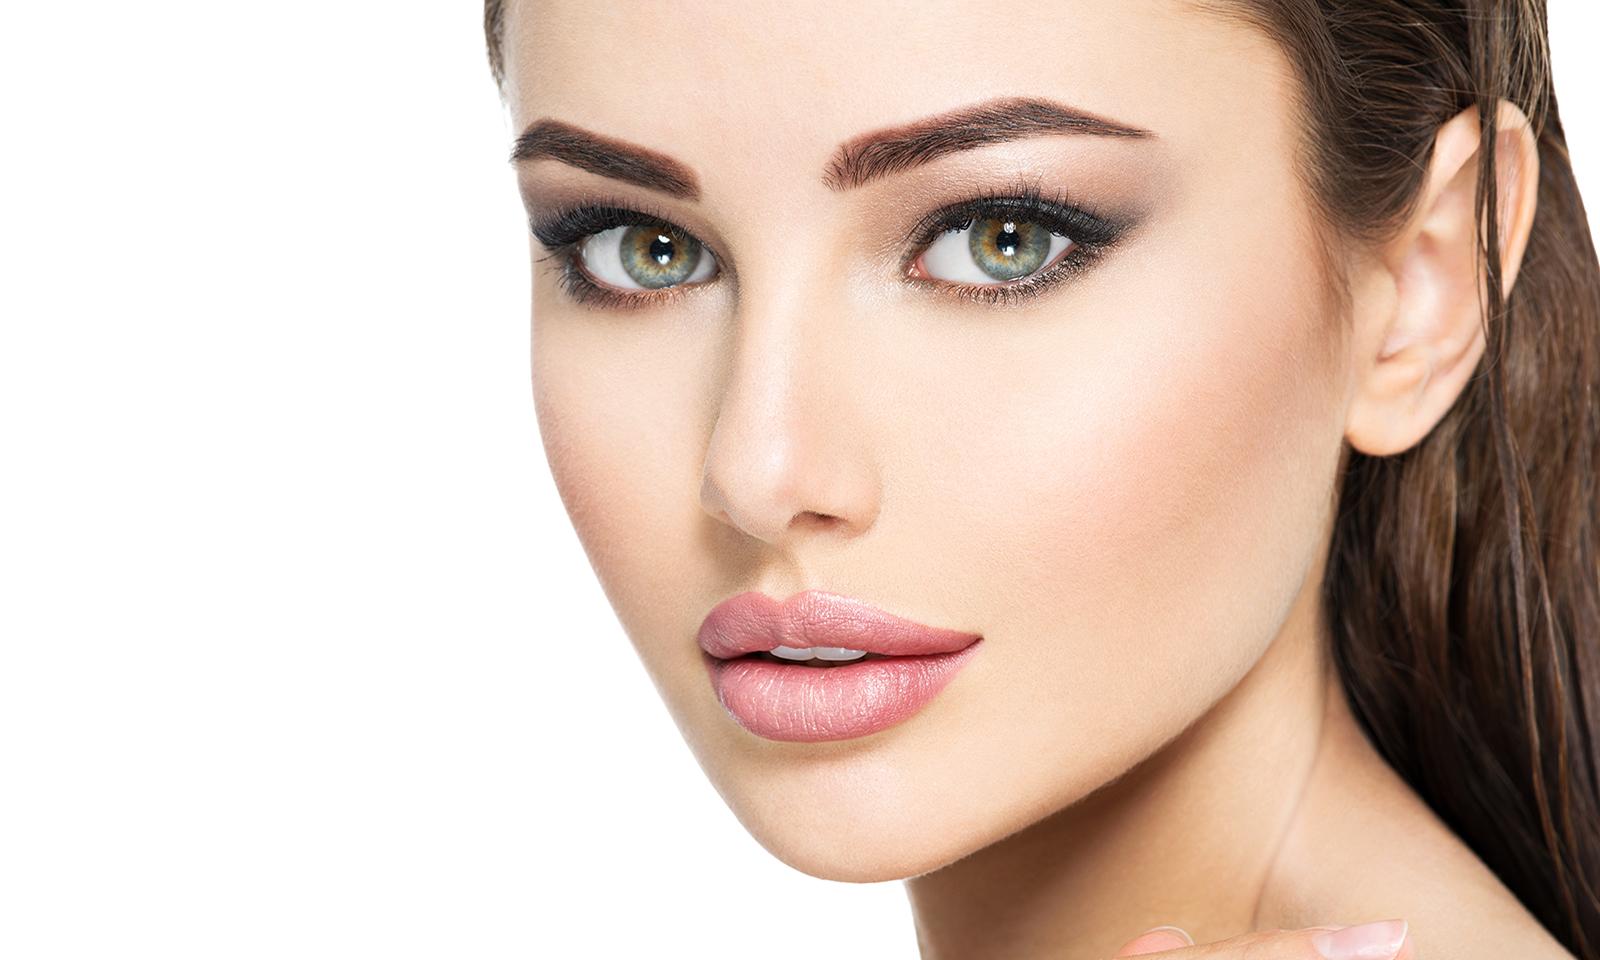 beauty-skincare-beautiful-woman-with-big-eyes-looking-at-camera